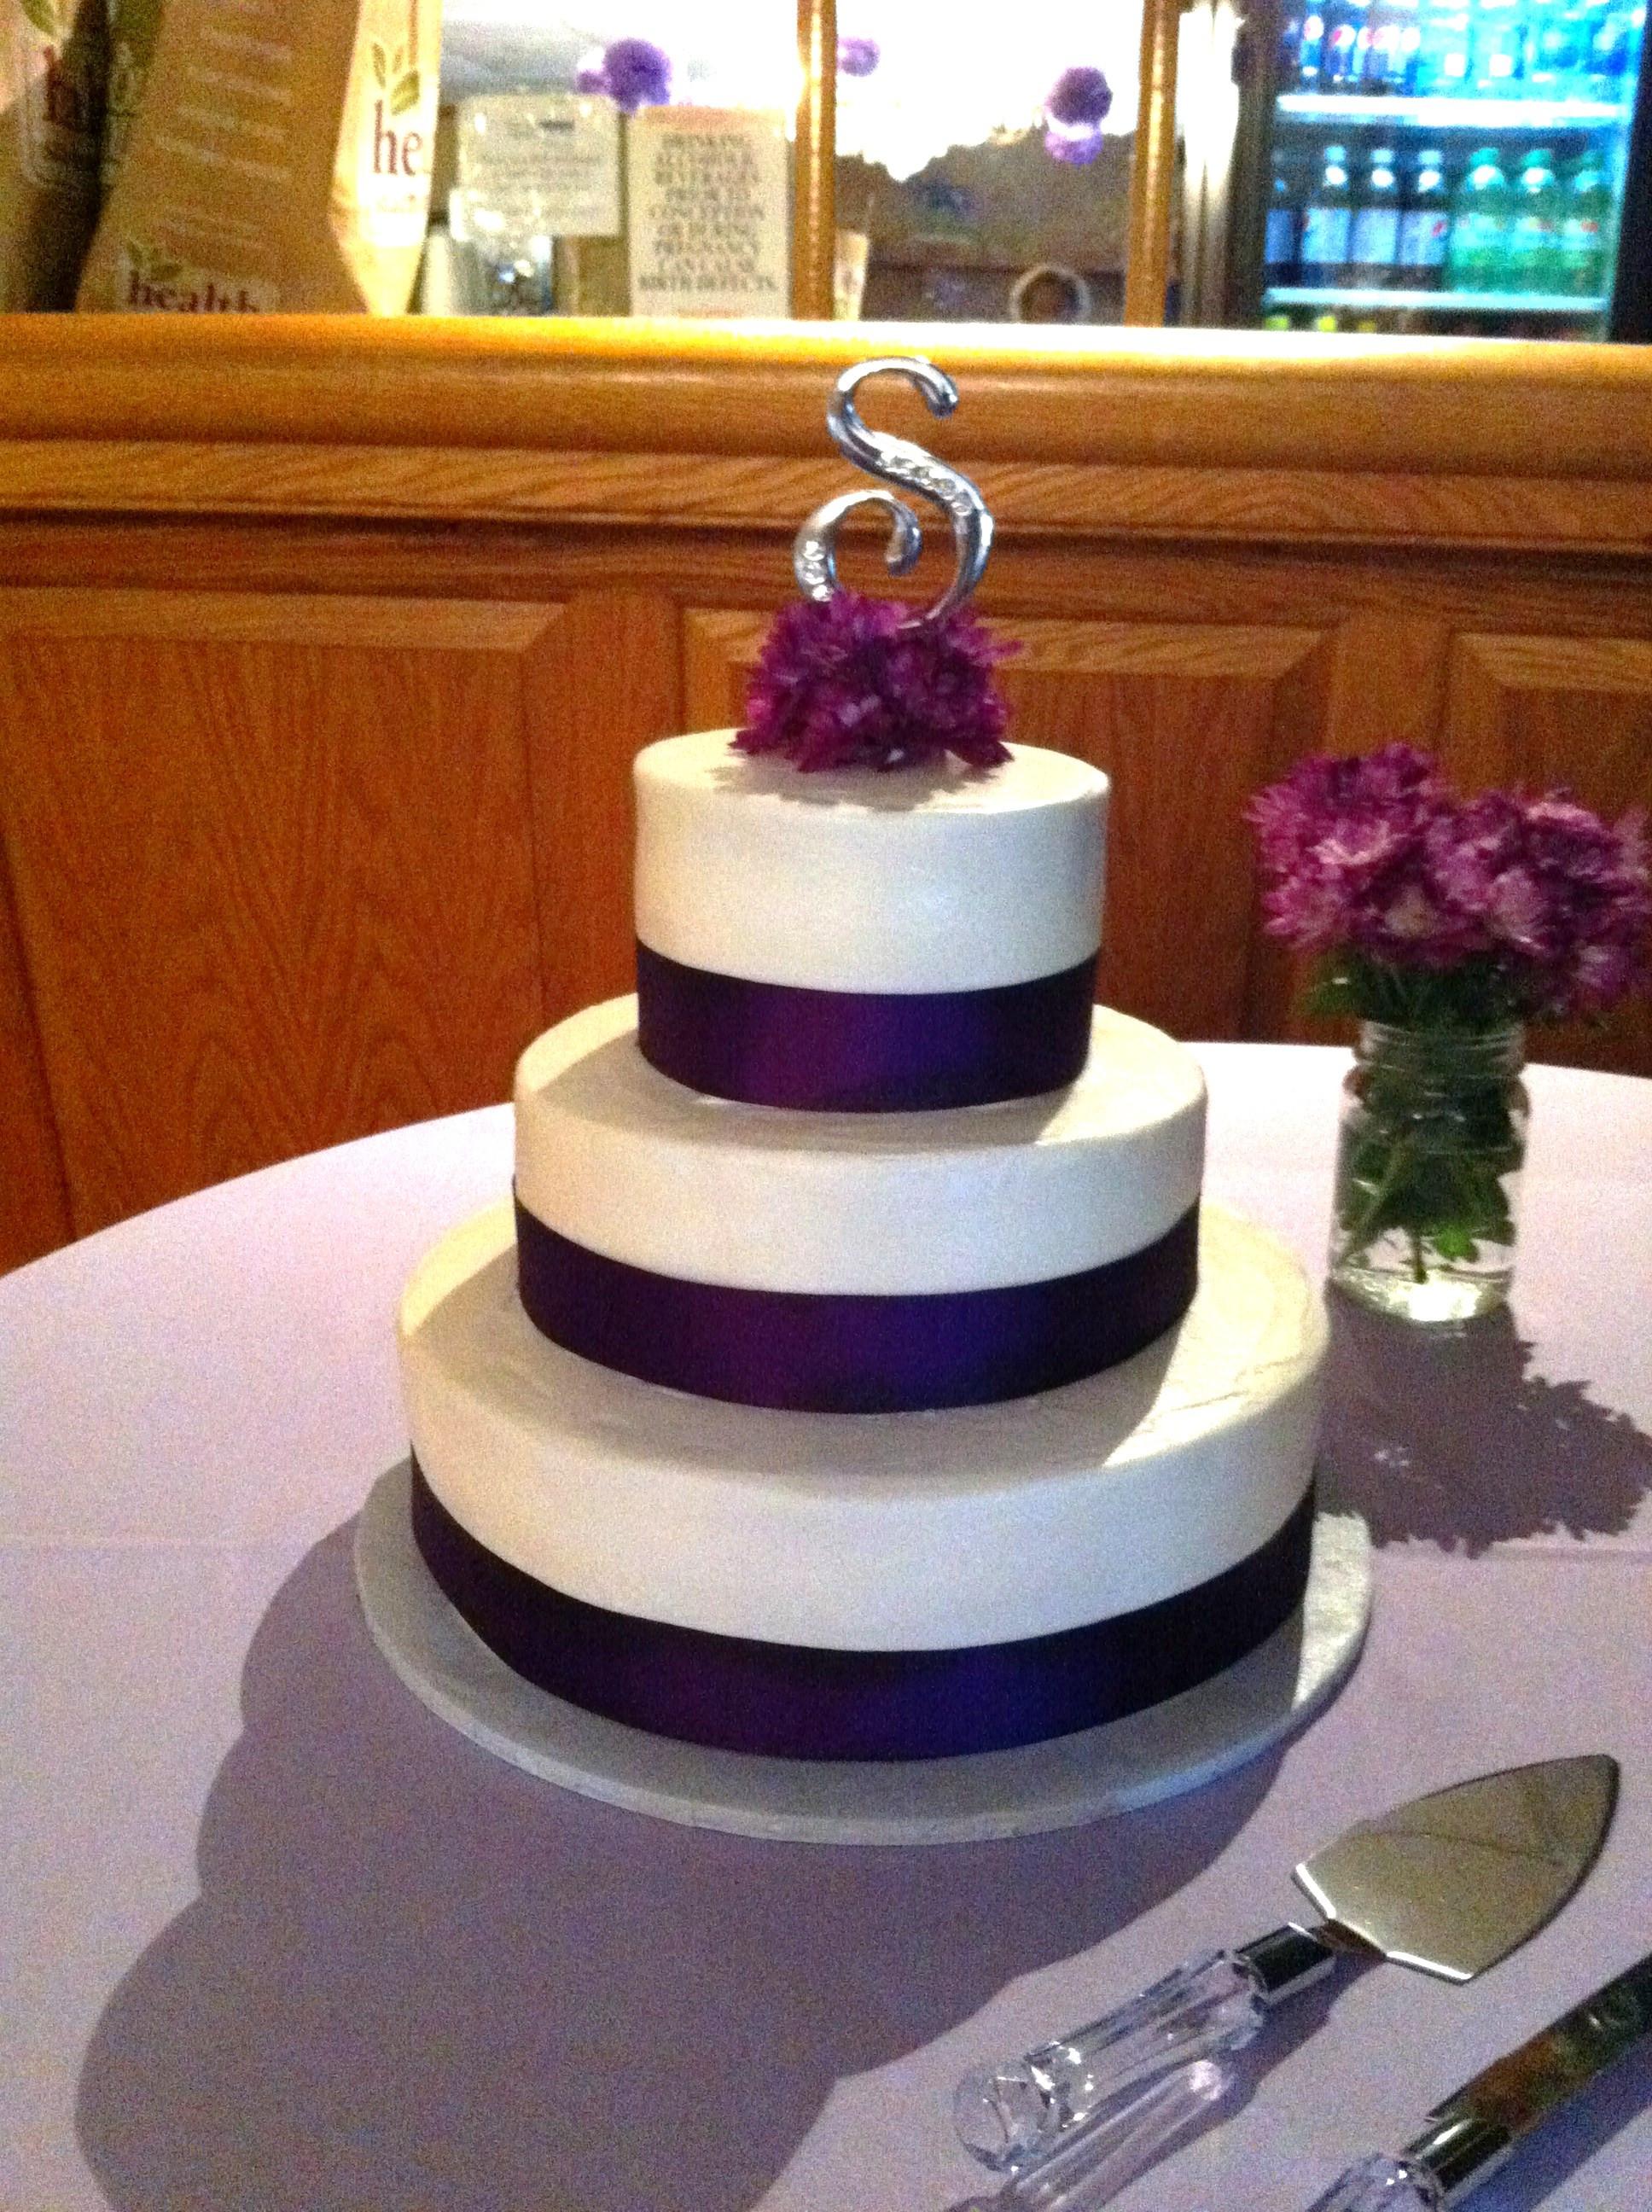 Wedding Cakes Purple And White  Classic White Wedding Cake w Purple Decorations